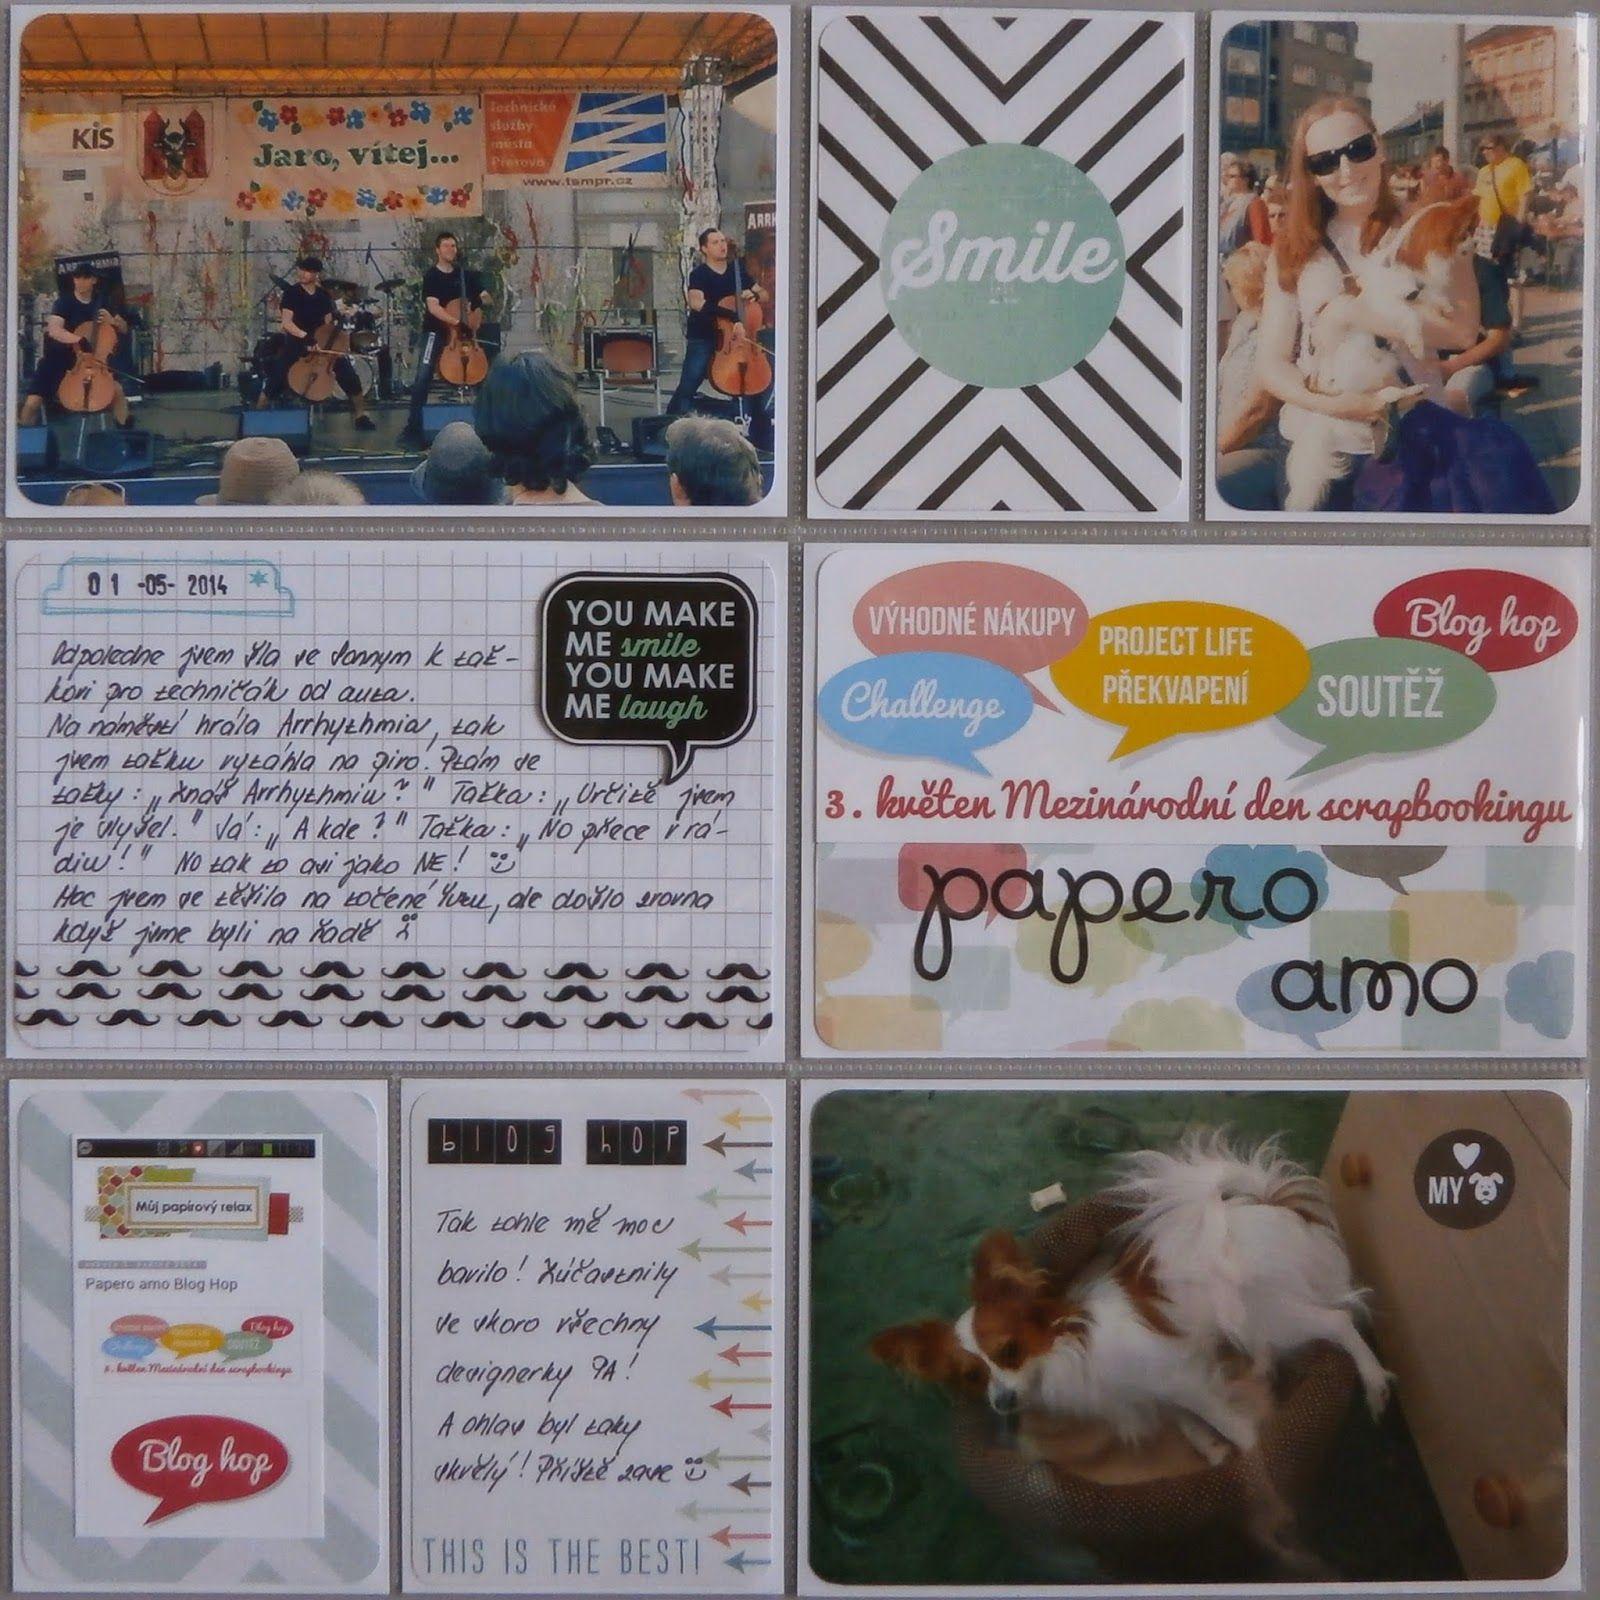 Project life 2014 - 18. týden (pravá strana)